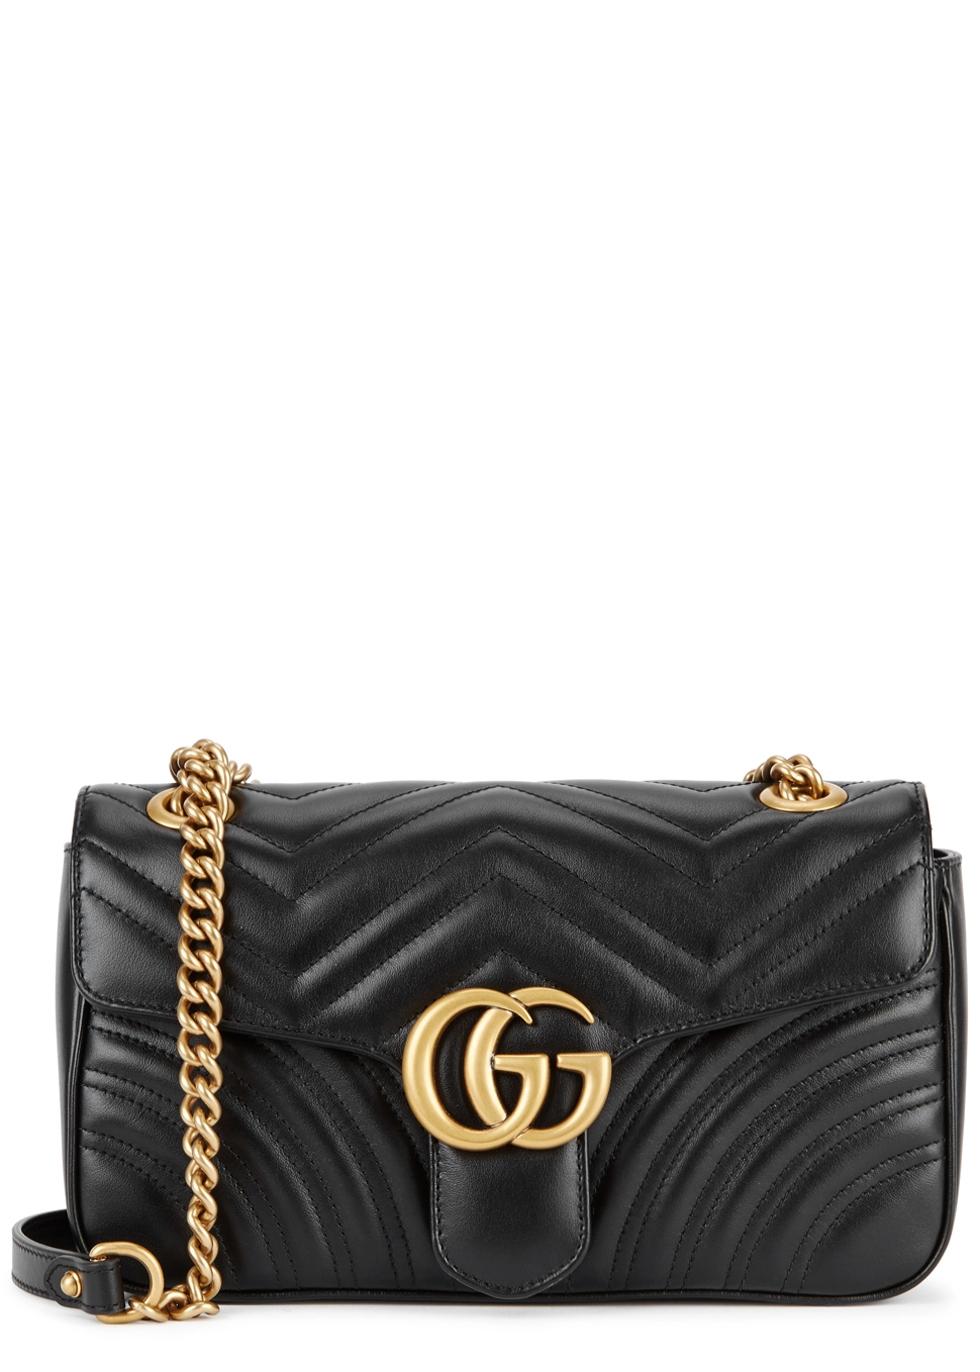 Womens Designer Bags Handbags And Purses Harvey Nichols Women Genuine Leather Gold